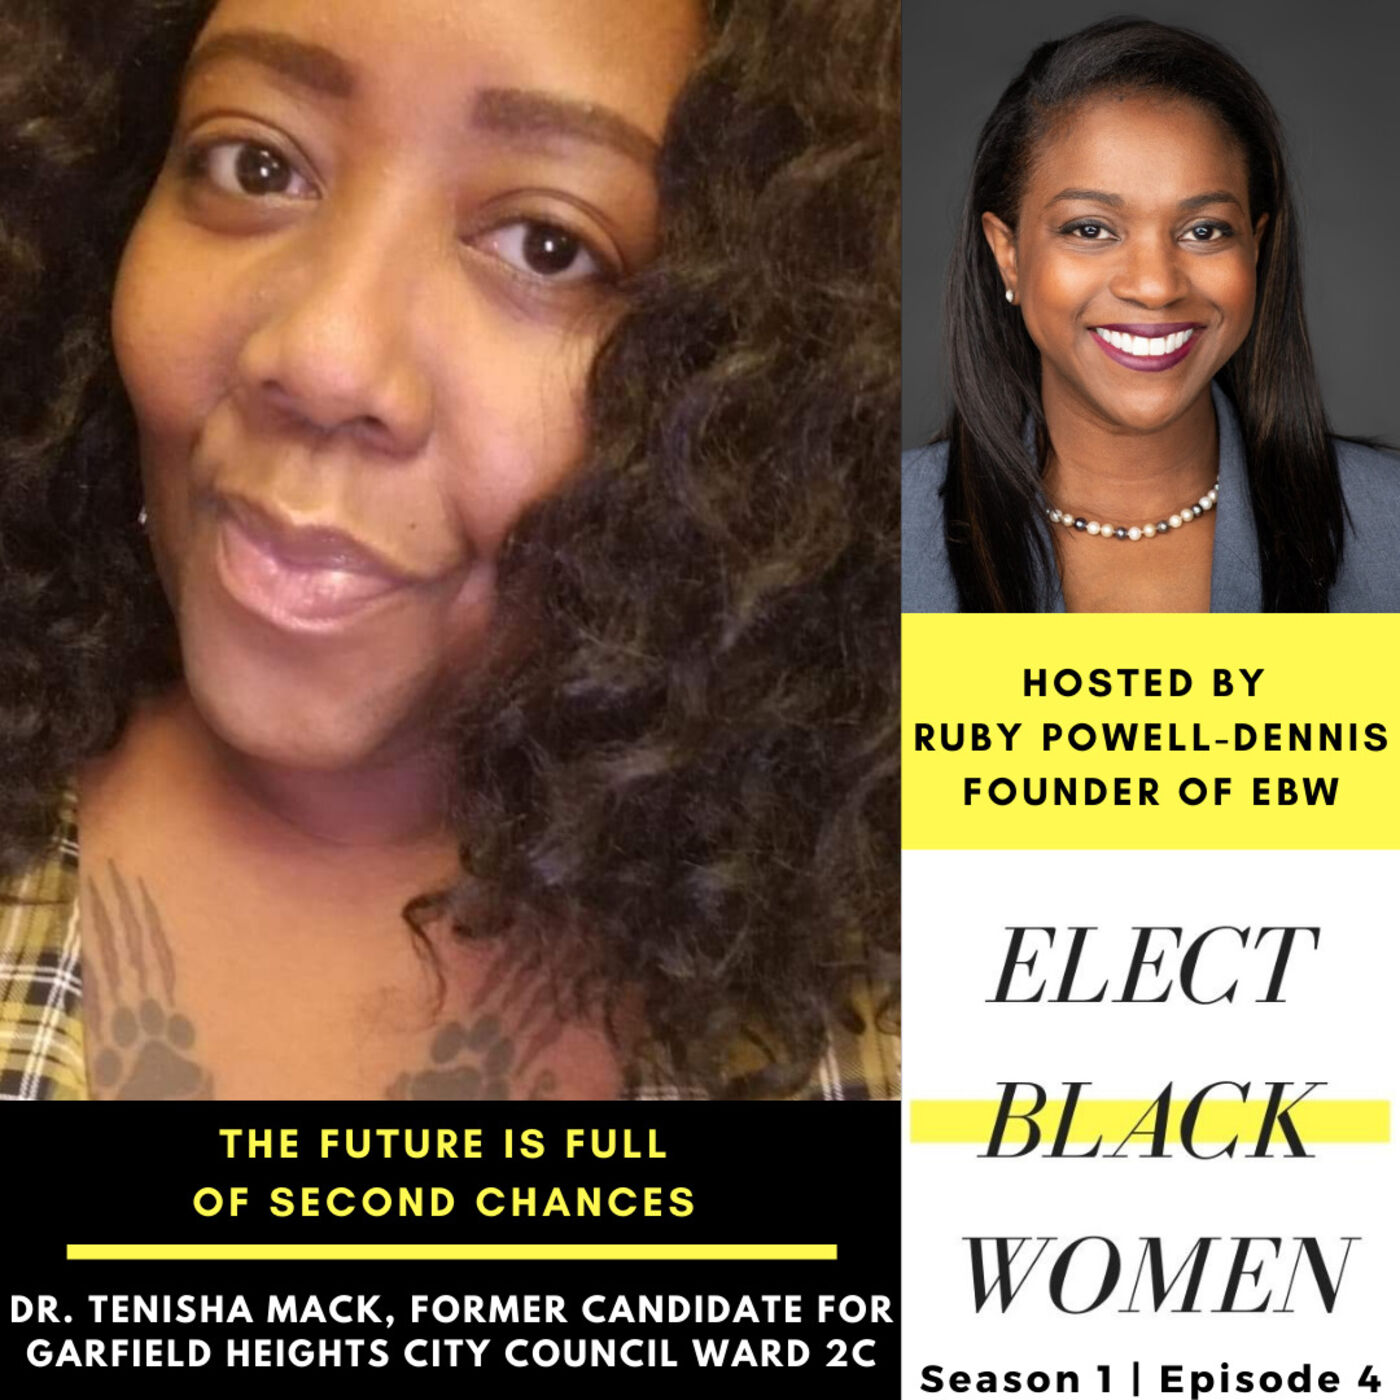 Meet Dr. Tenisha Mack | Former Candidate for U.S. Congress (FL-18)